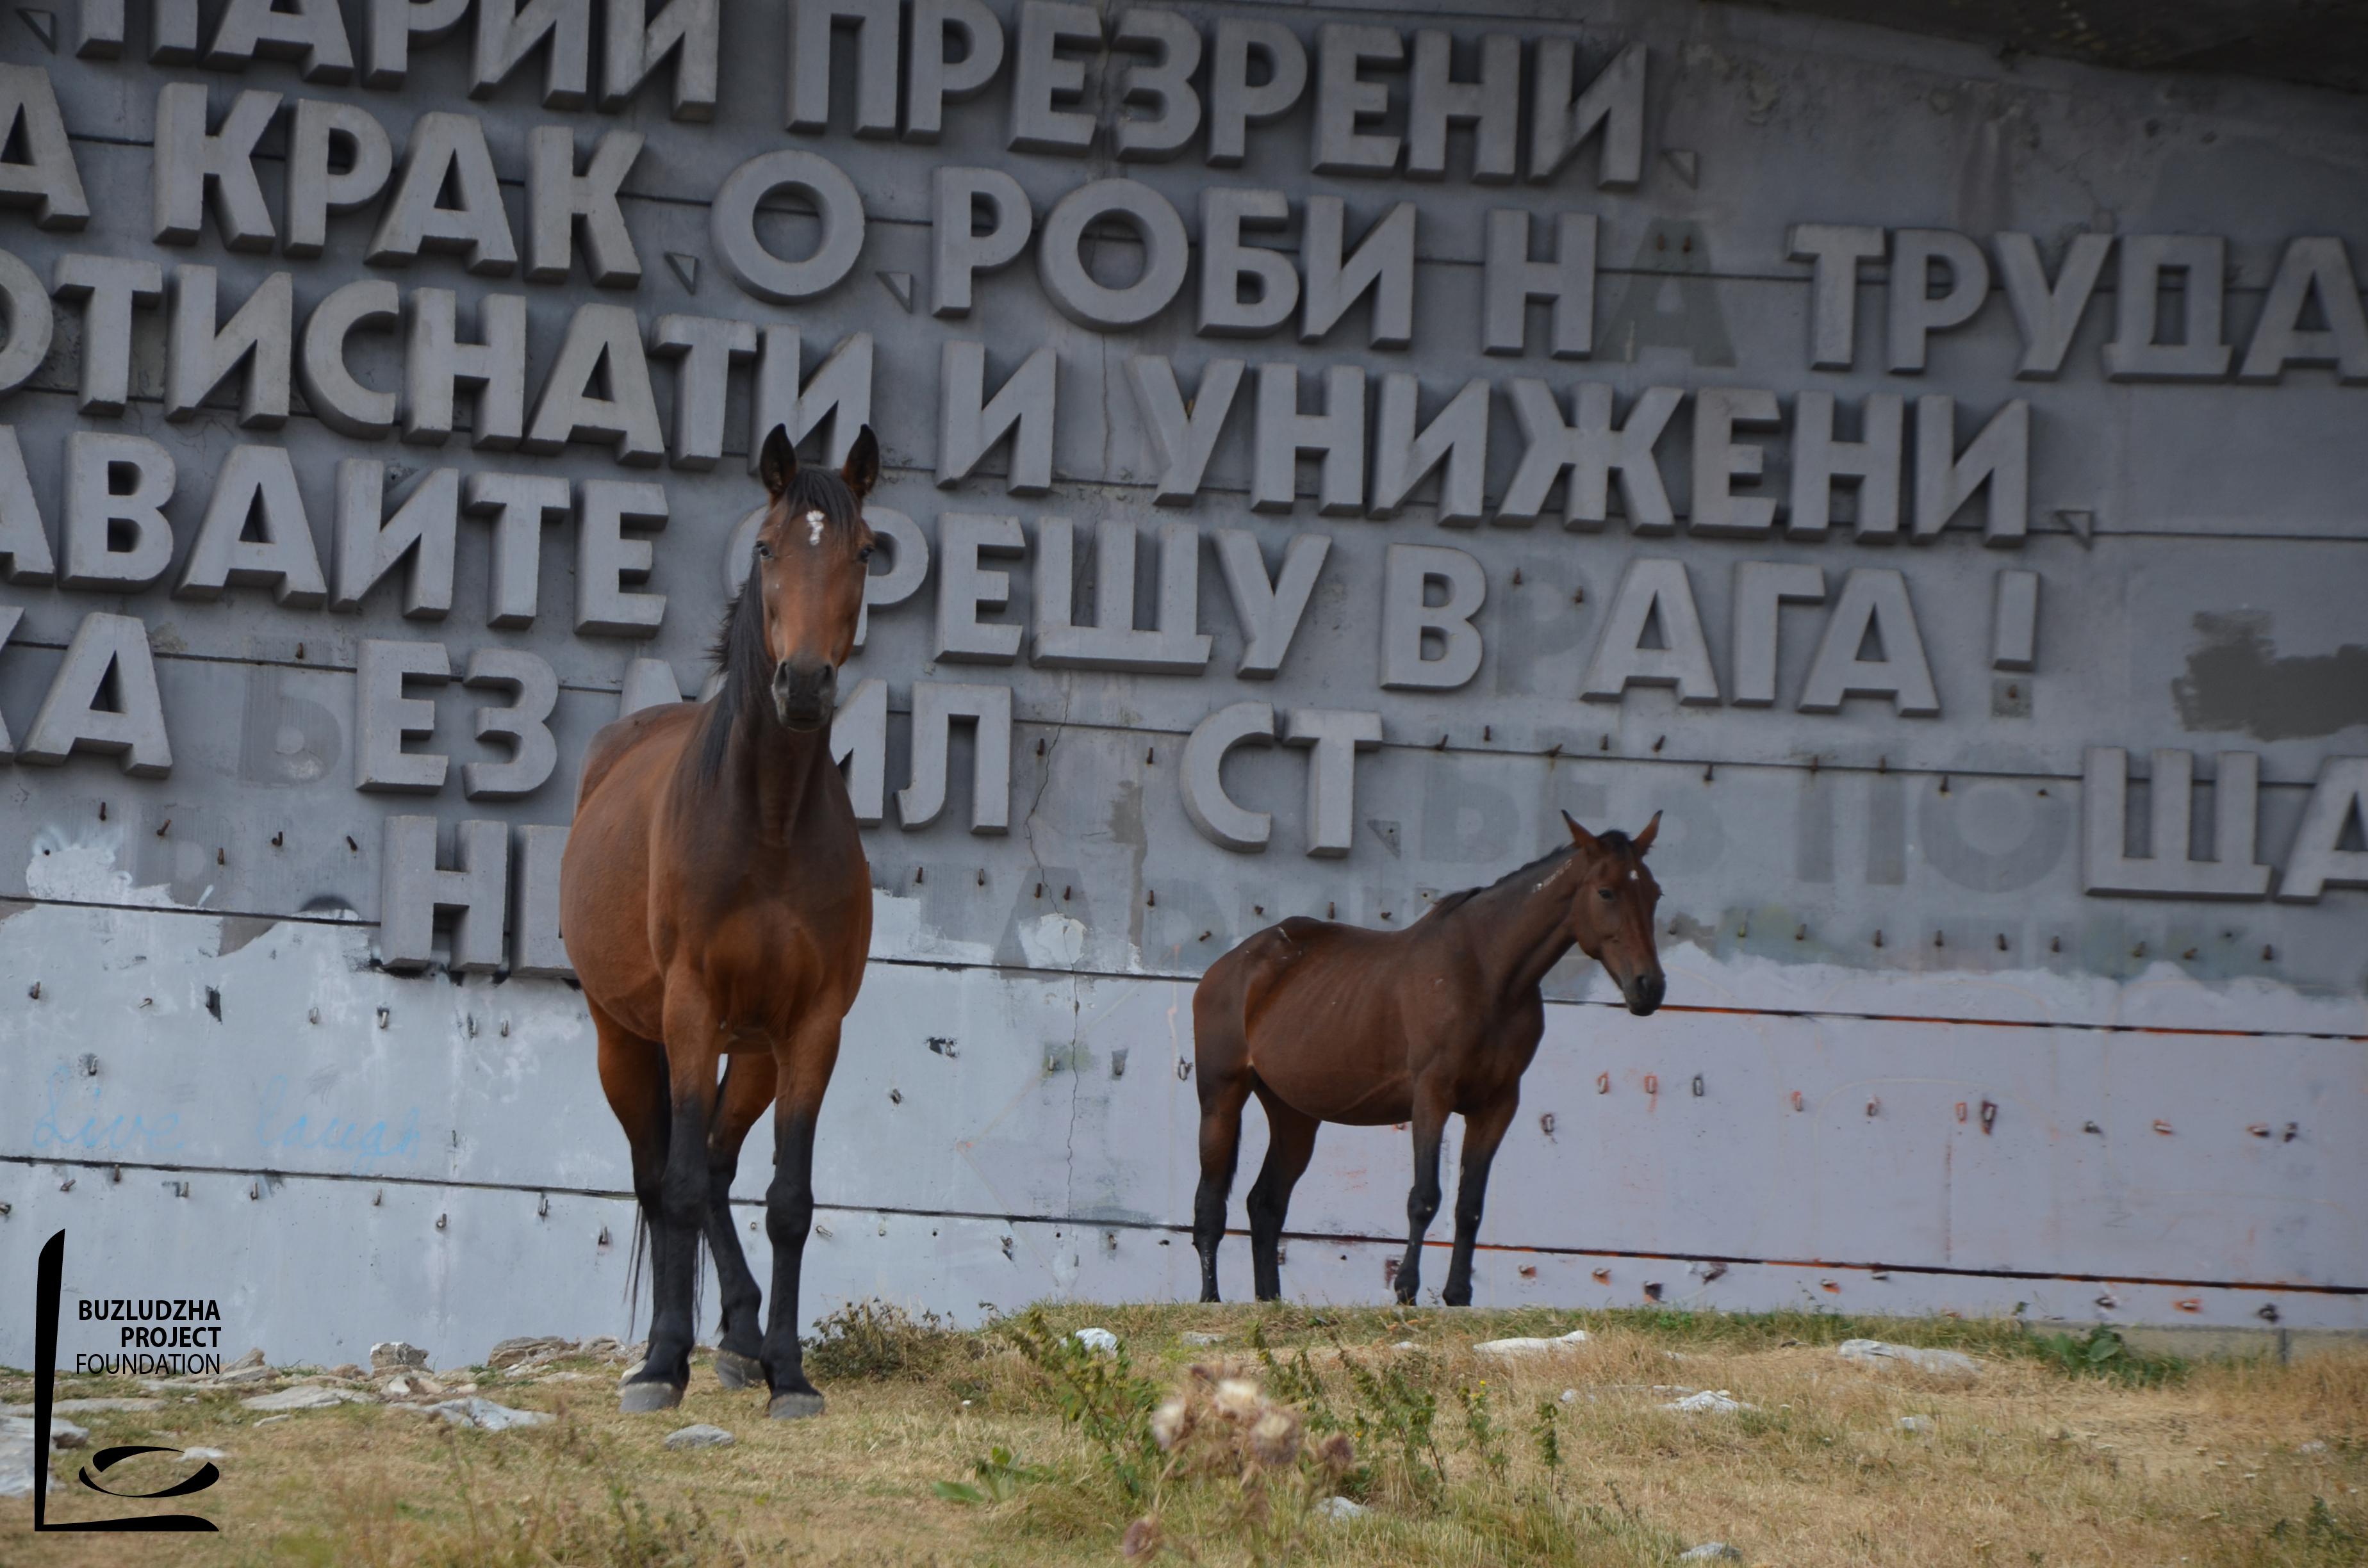 Wild horses in front of the Buzludzha monument.